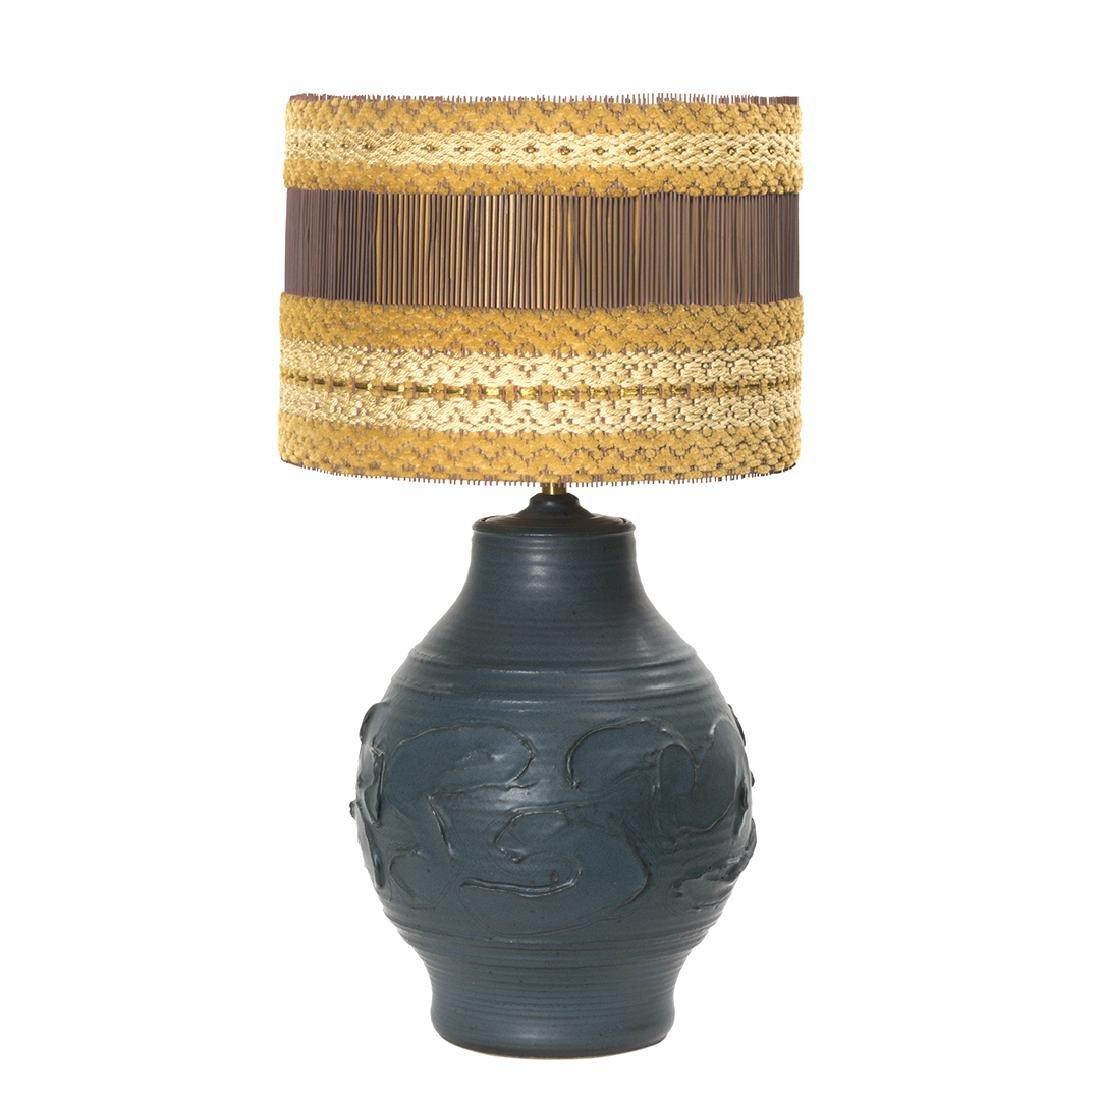 Bob Kinzie and Maria Kipp Stoneware Lamp and Shade